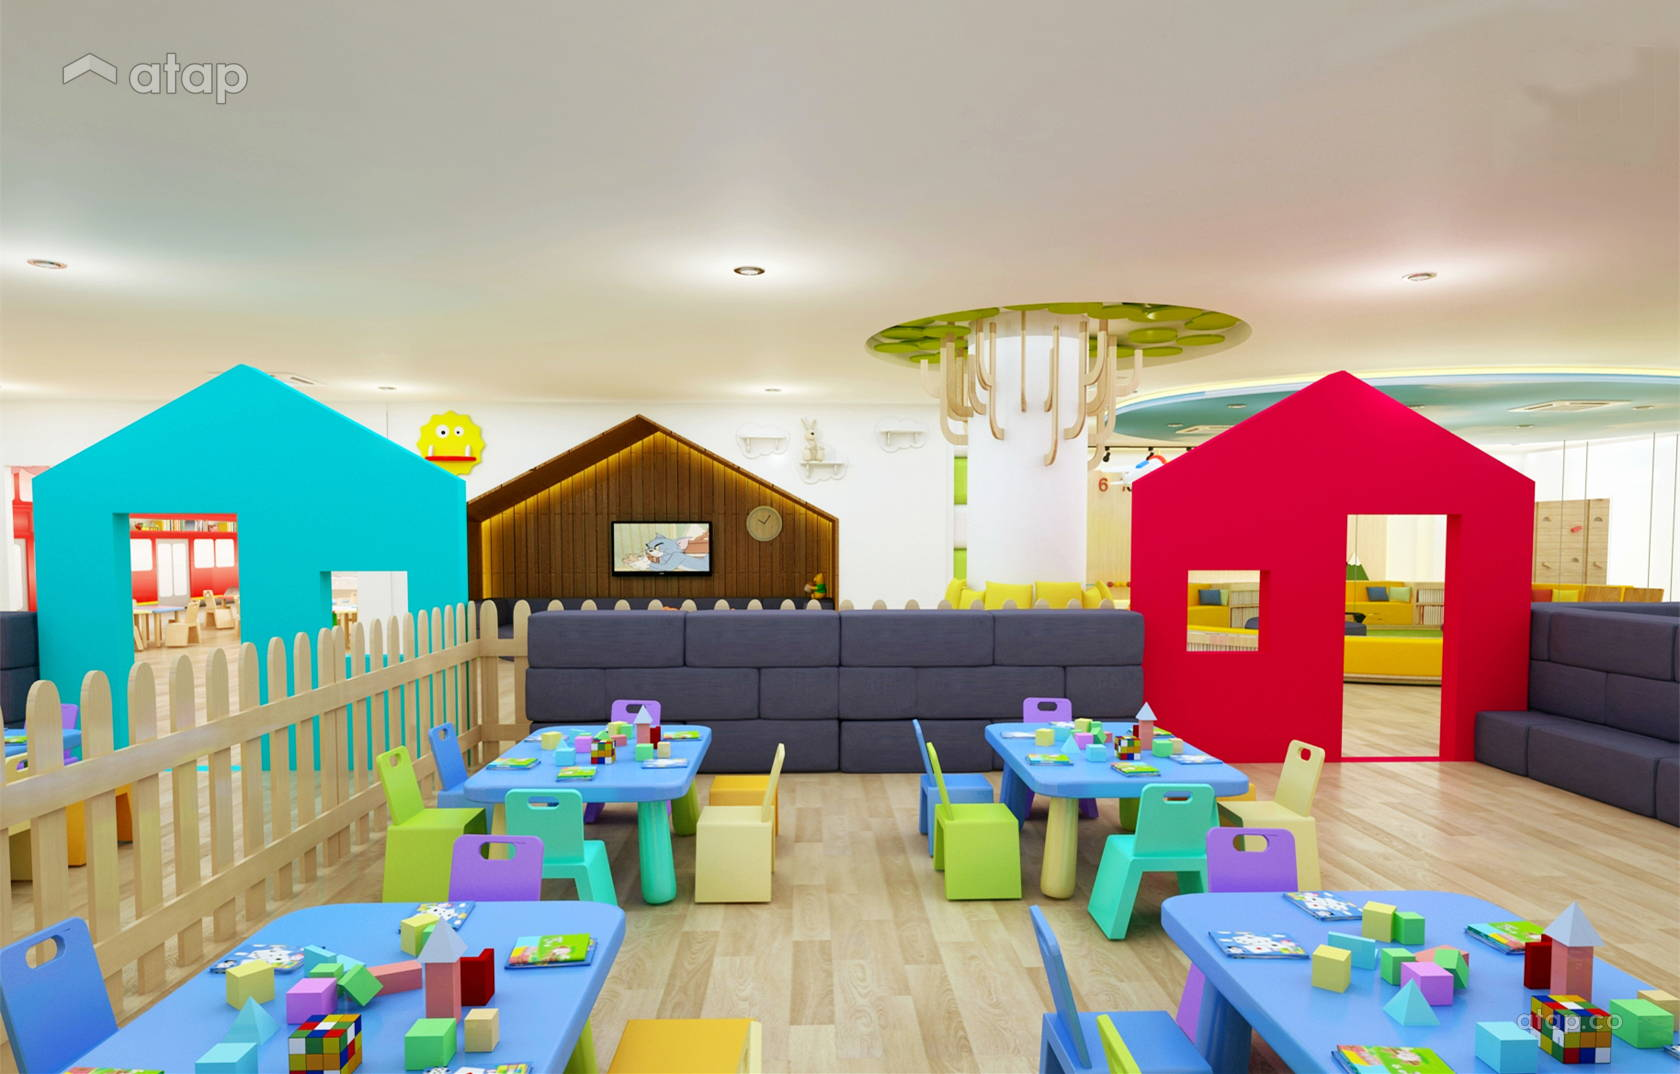 Putrajaya Childcare Centre Architectural Interior Design